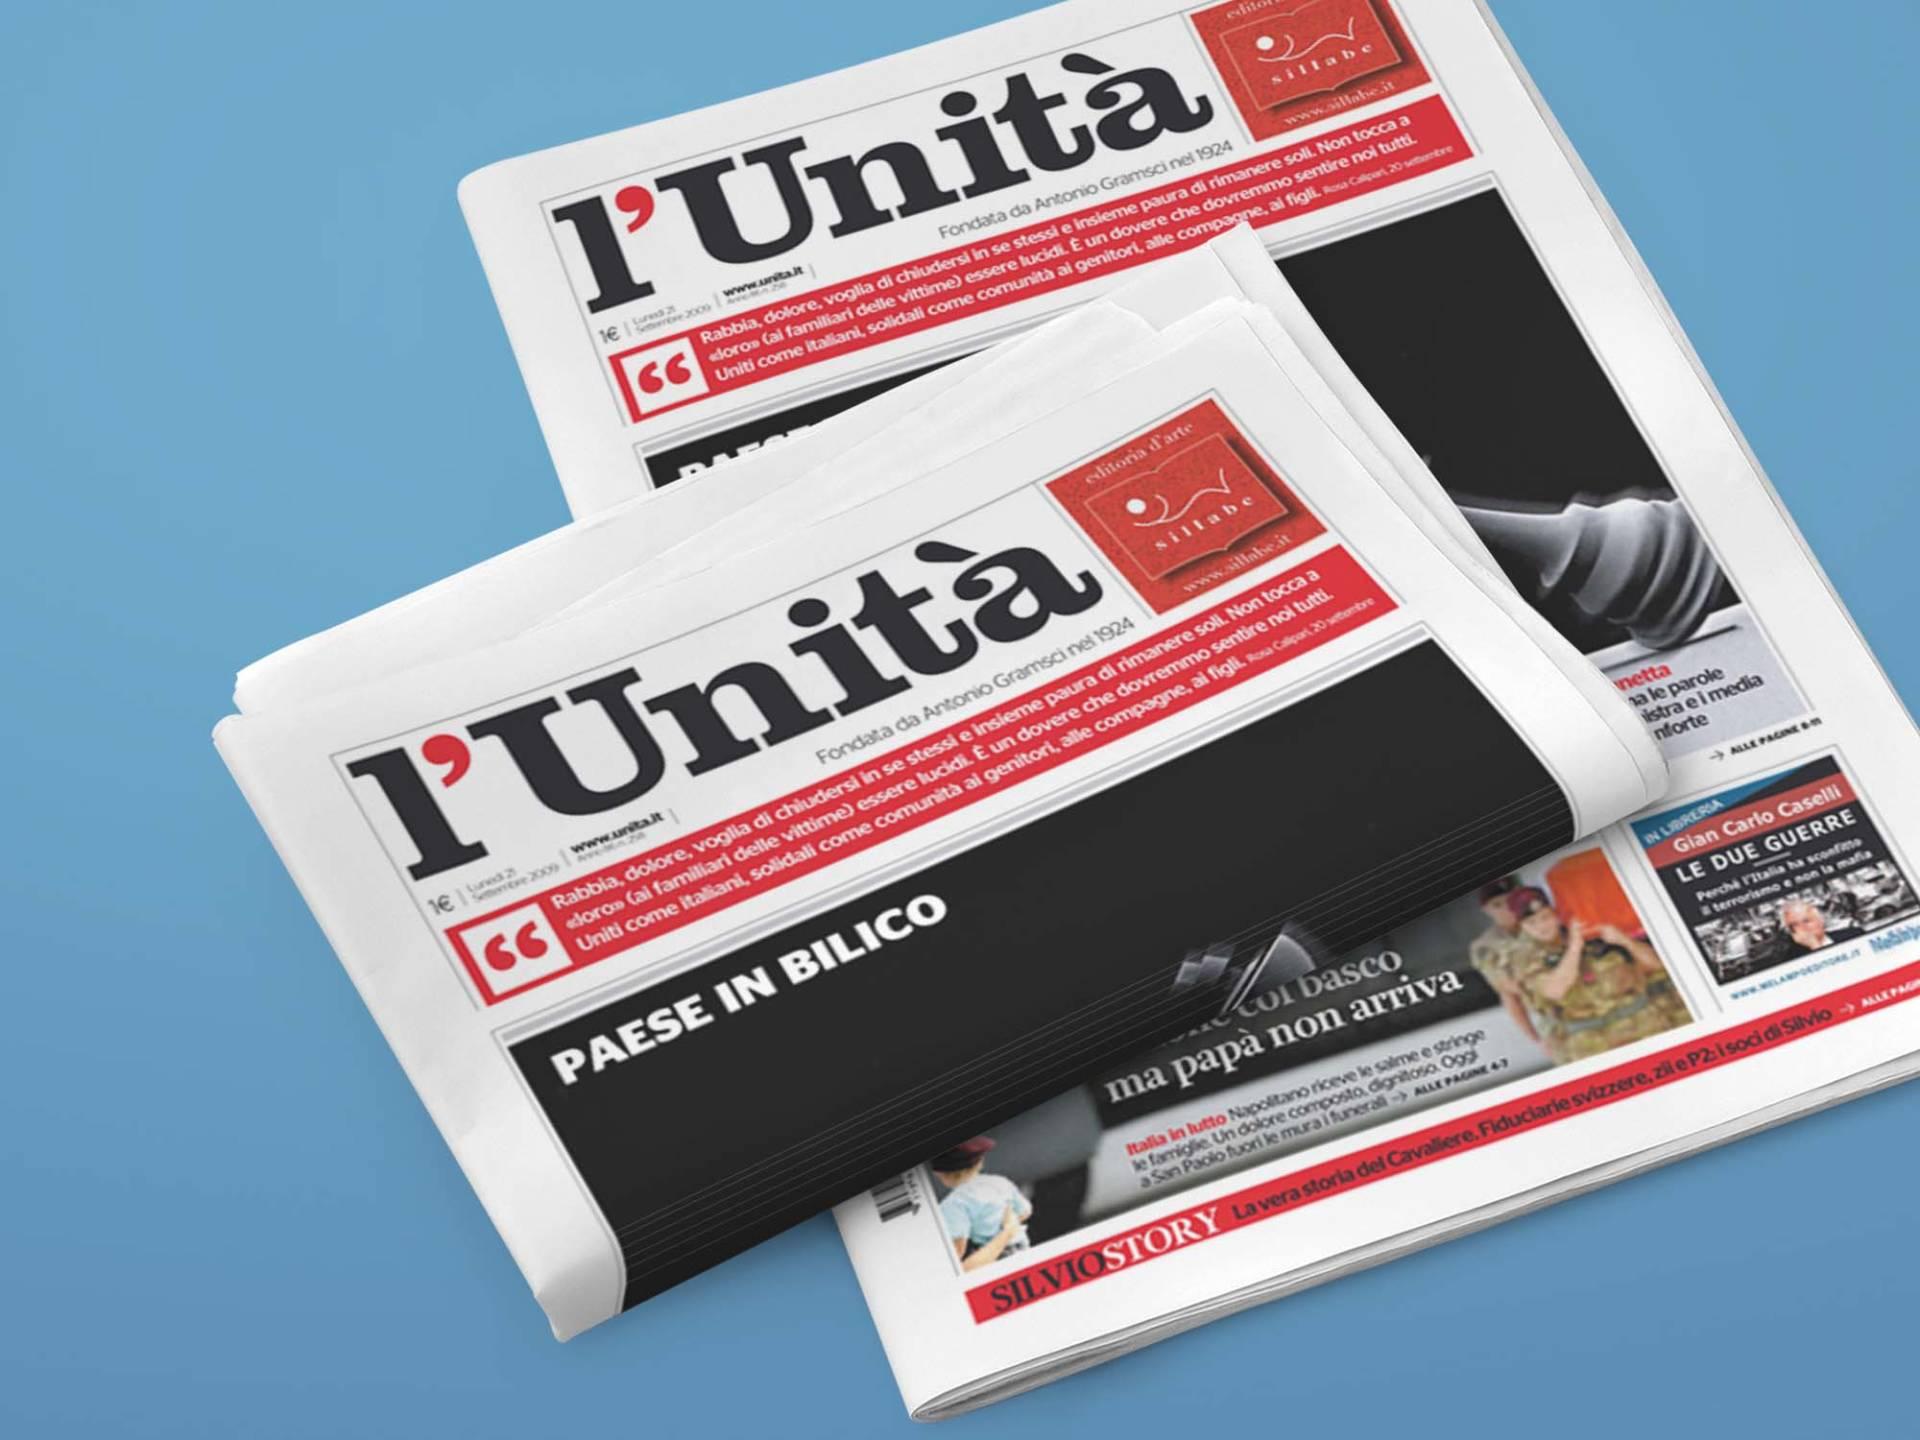 L'Unità_01_Wenceslau_News_Design